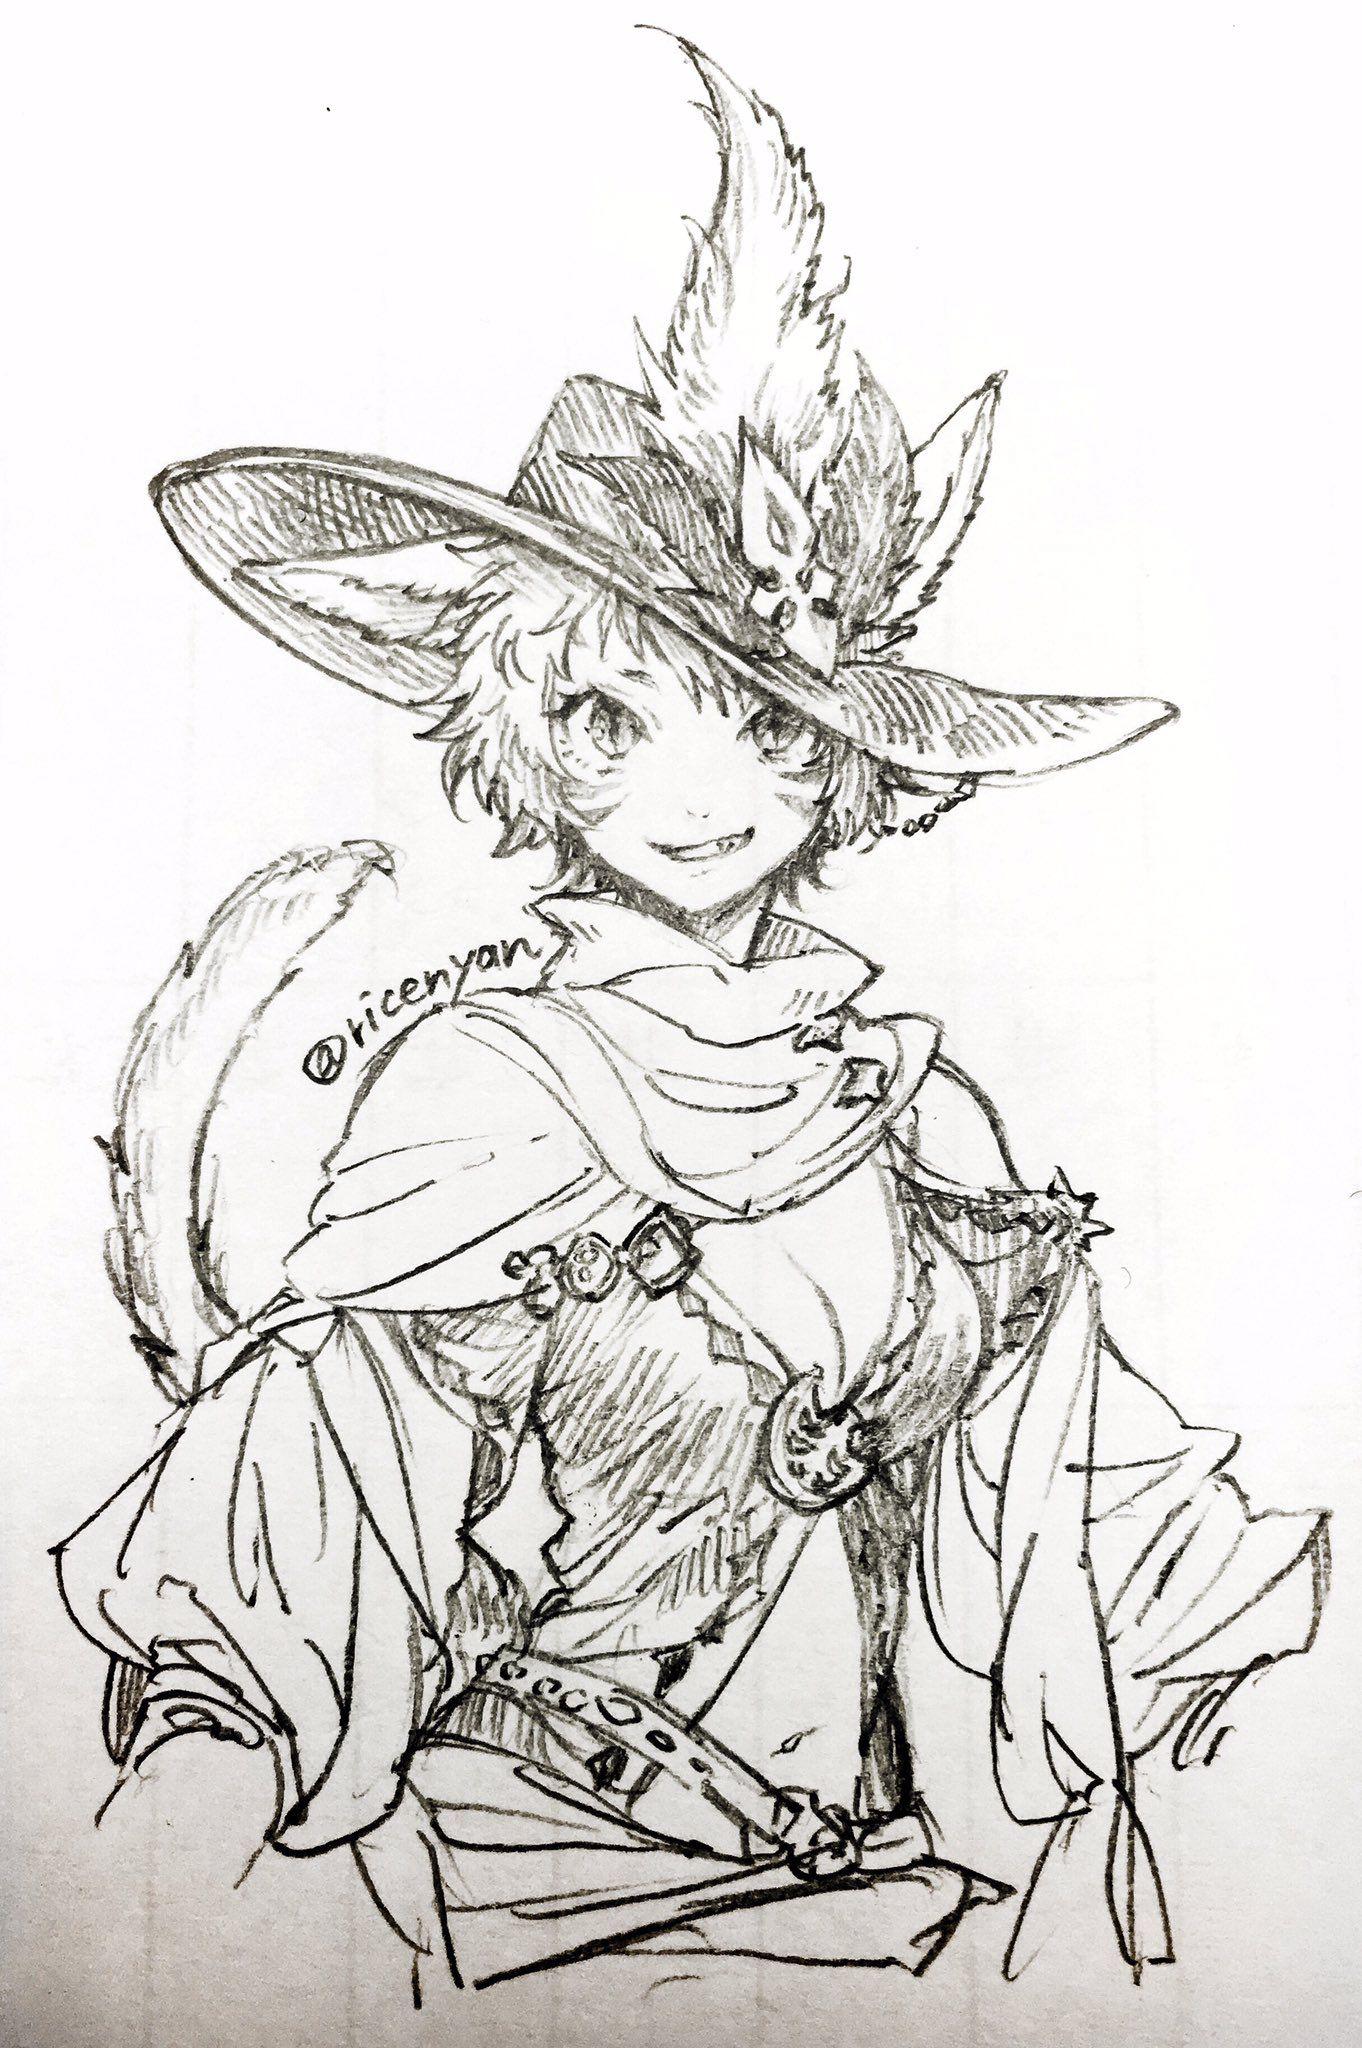 Don On In 2019 Final Fantasy Artwork Fantasy Artwork